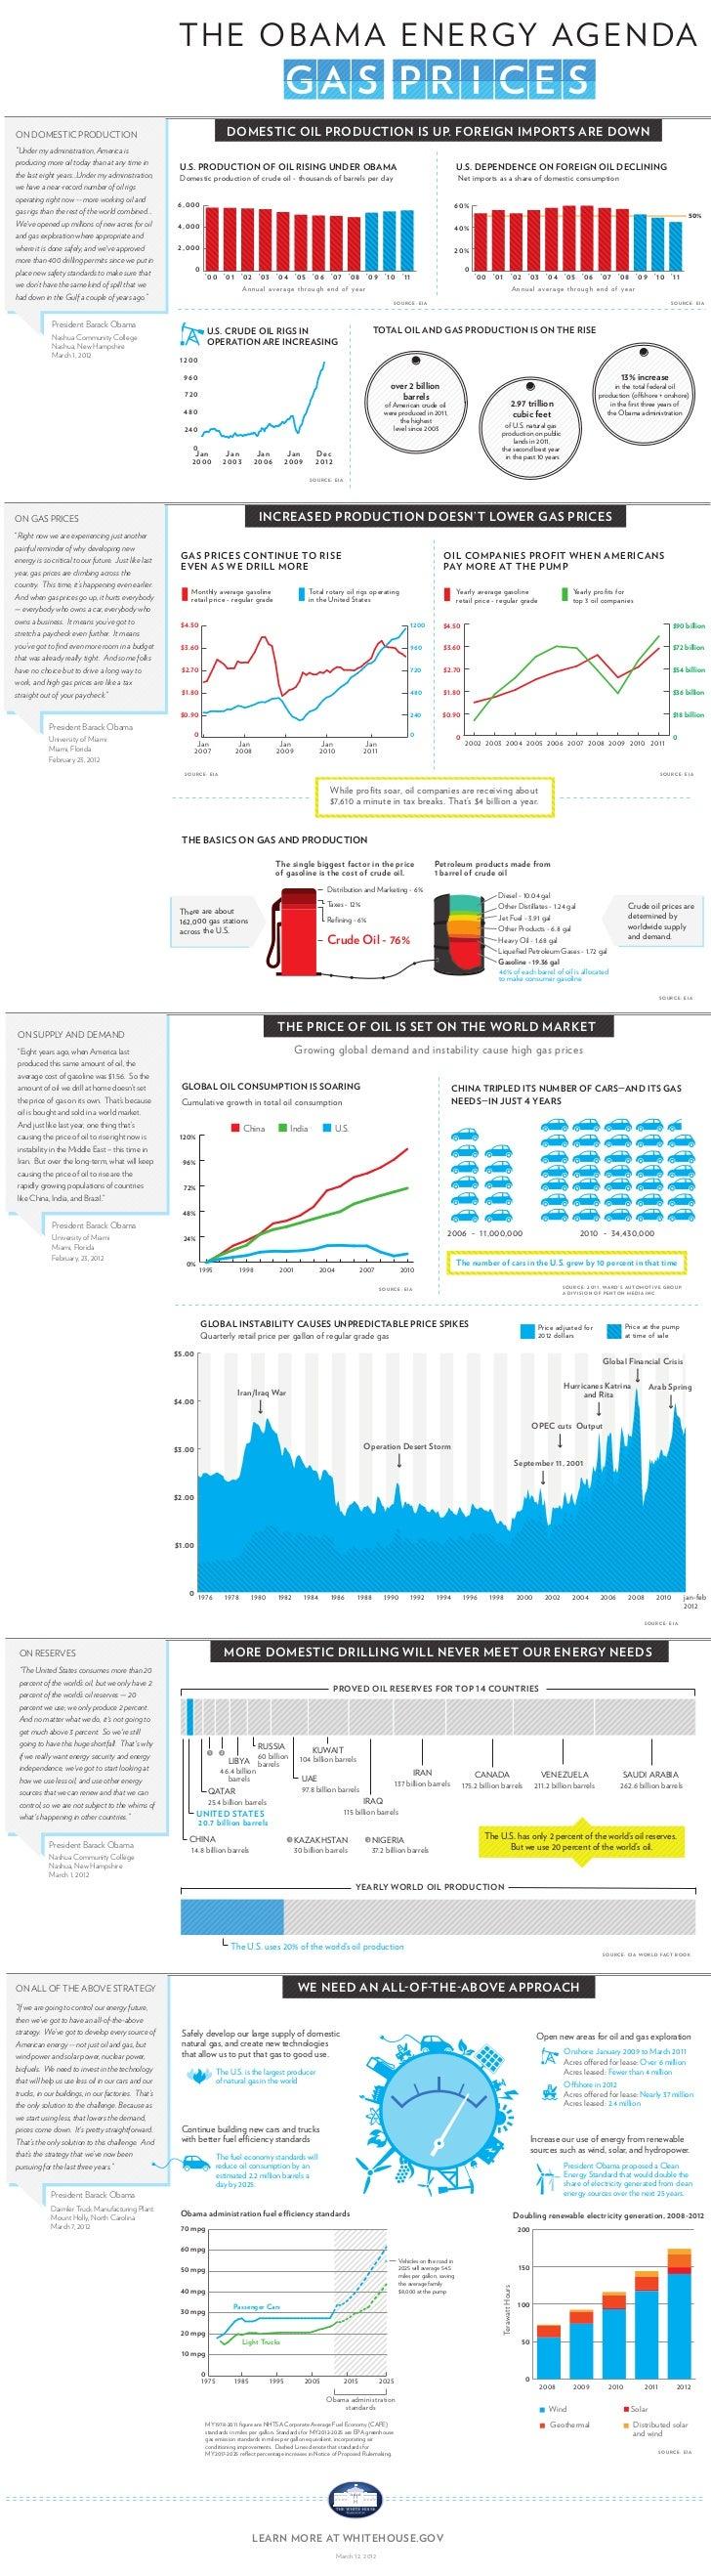 [Infographic] Obama Energy Agenda: Gas Prices